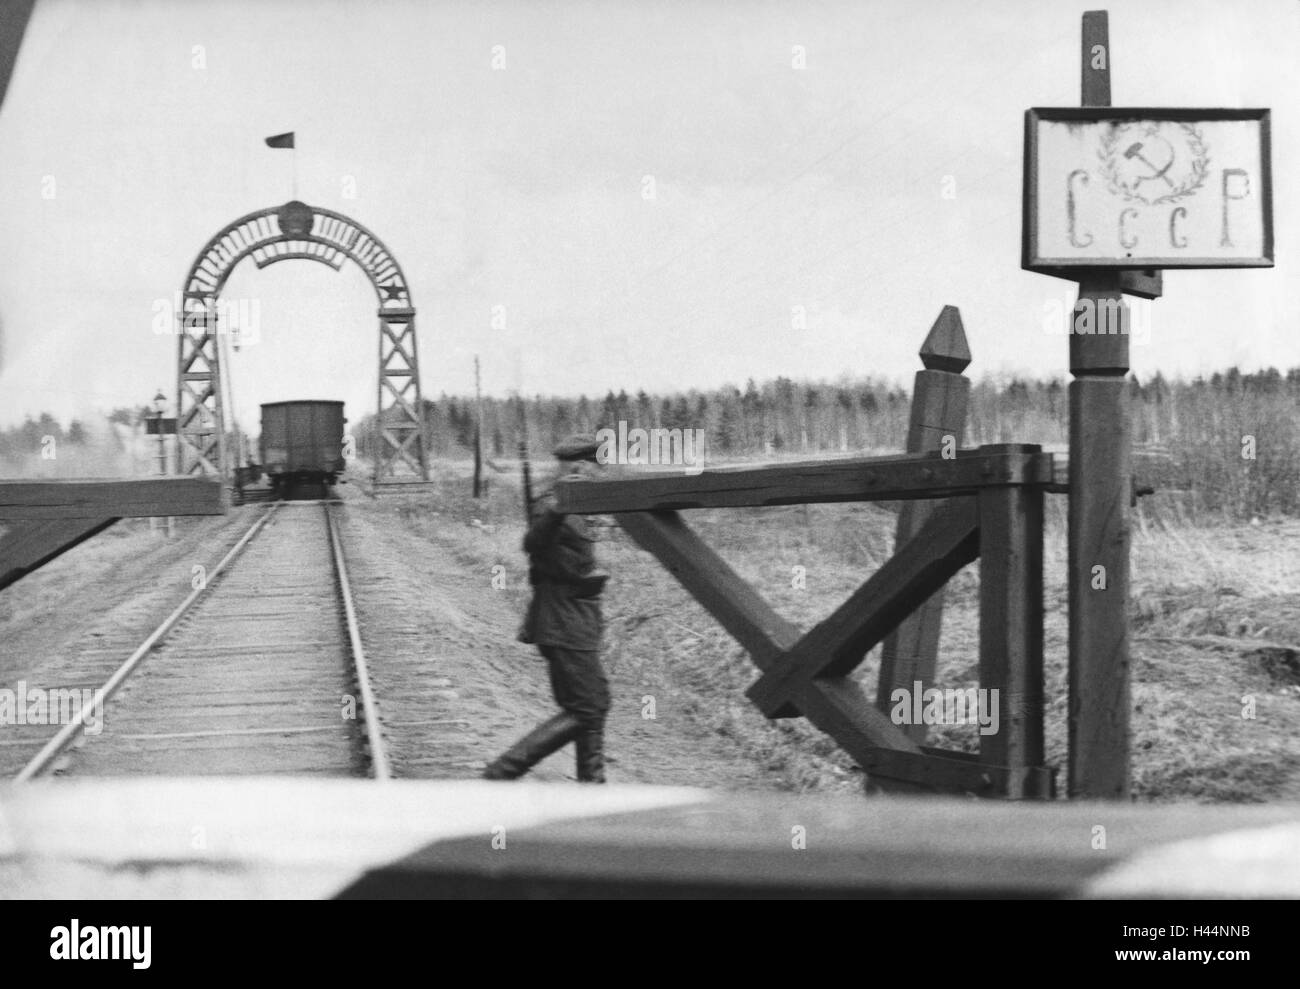 Train, wagon, view tracks, border, Soviet Union, border guard, Eastern Europe, the Soviet Union, SSSR, CCCP, trackage, - Stock Image